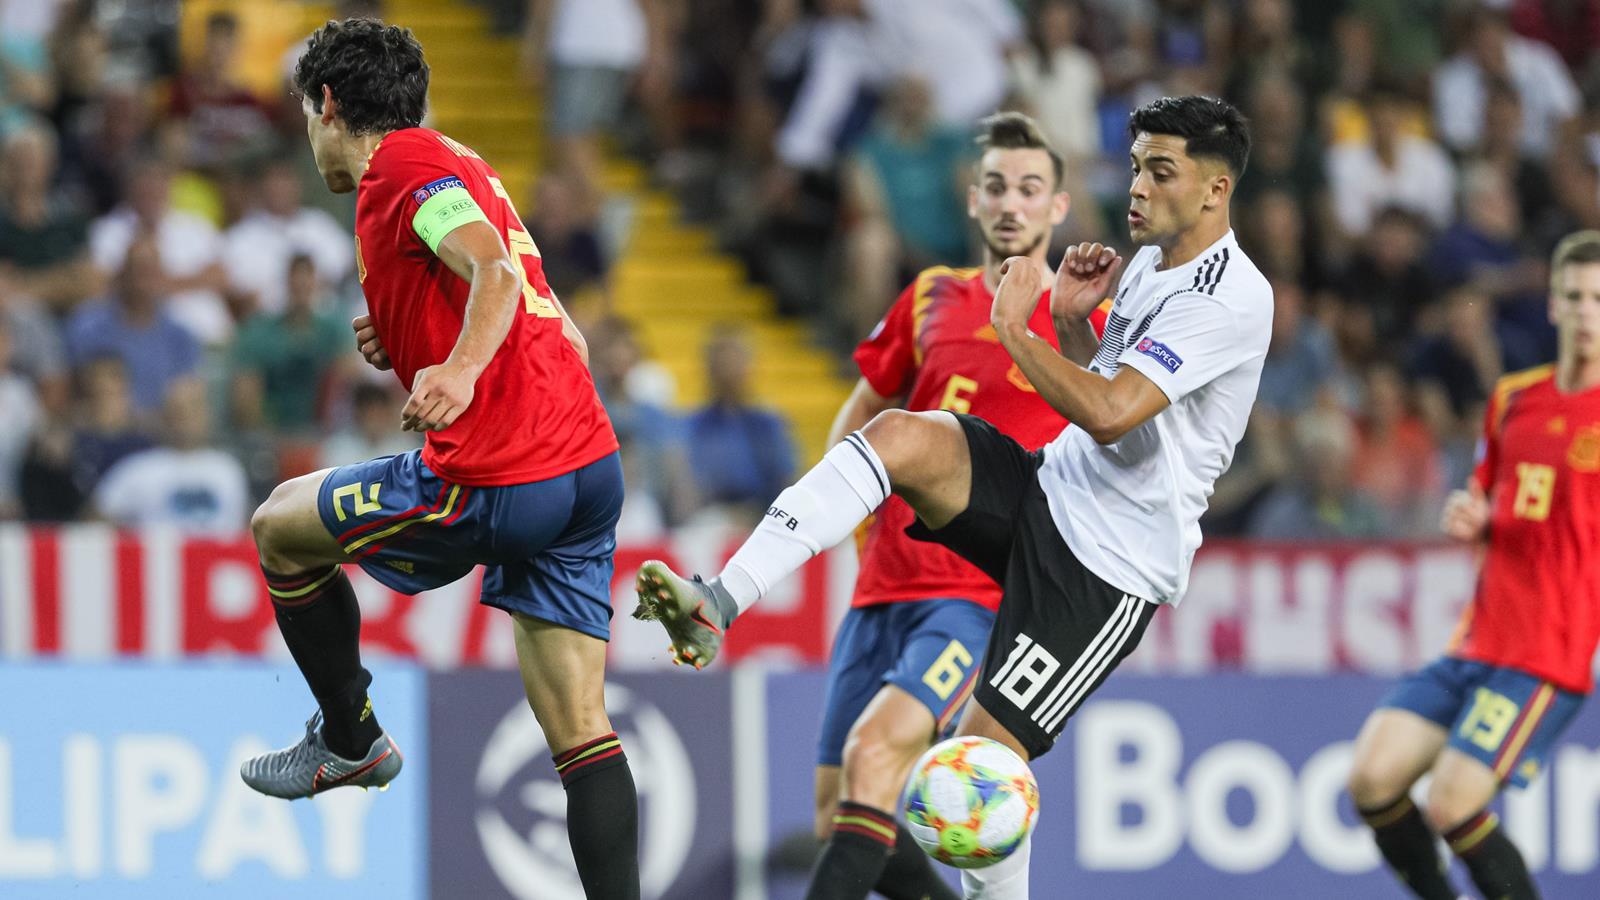 Fussball Em U21 2021